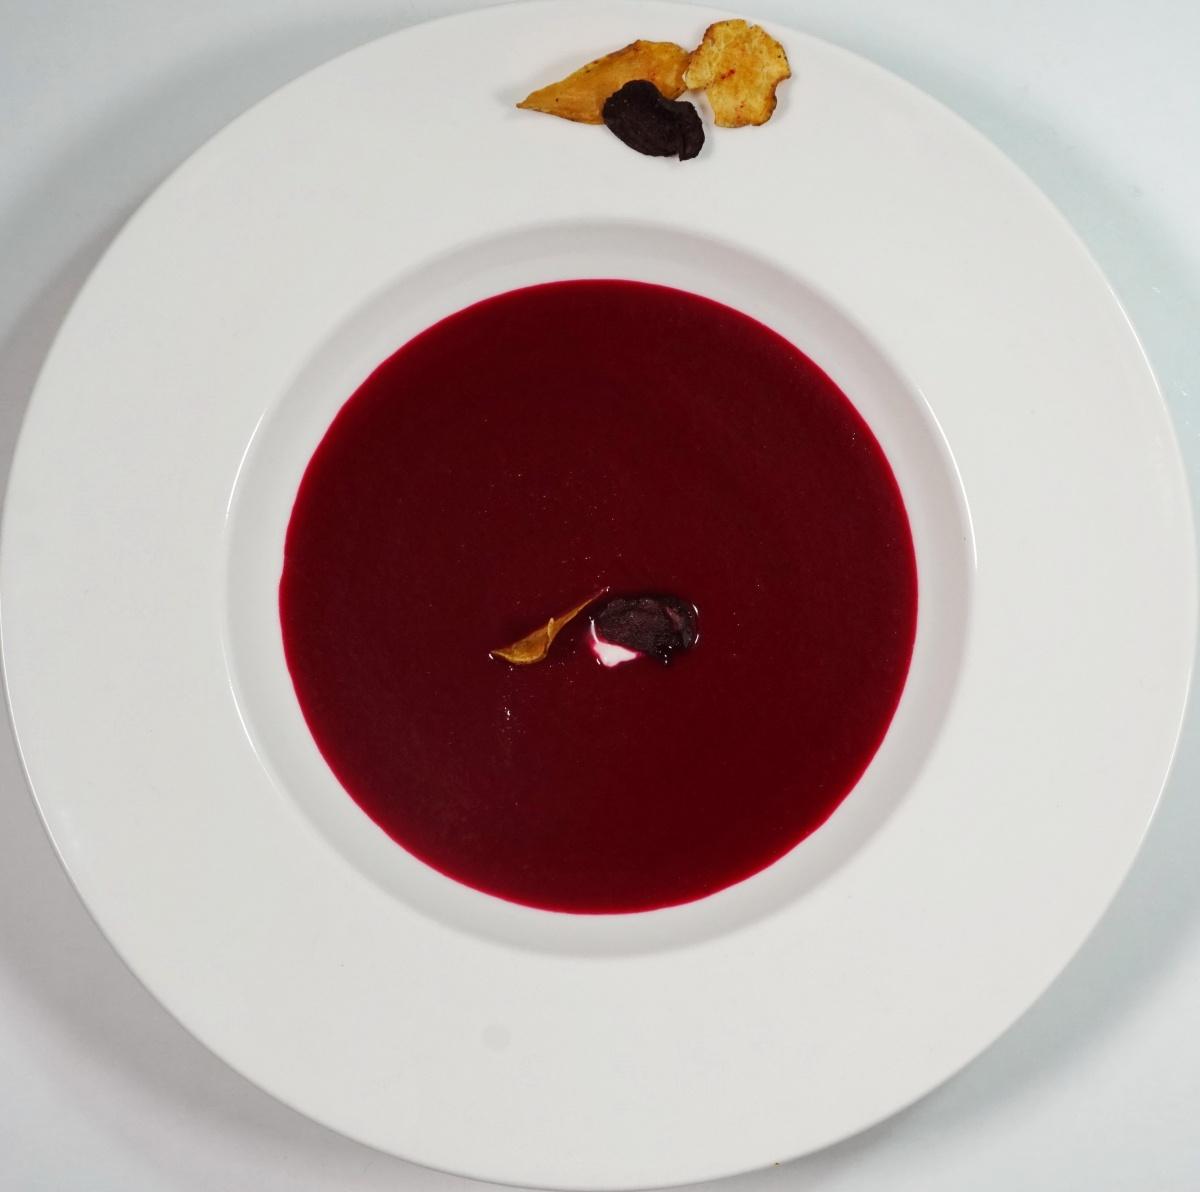 Rote Bete Suppe mit Apfel & on topGemüsechips